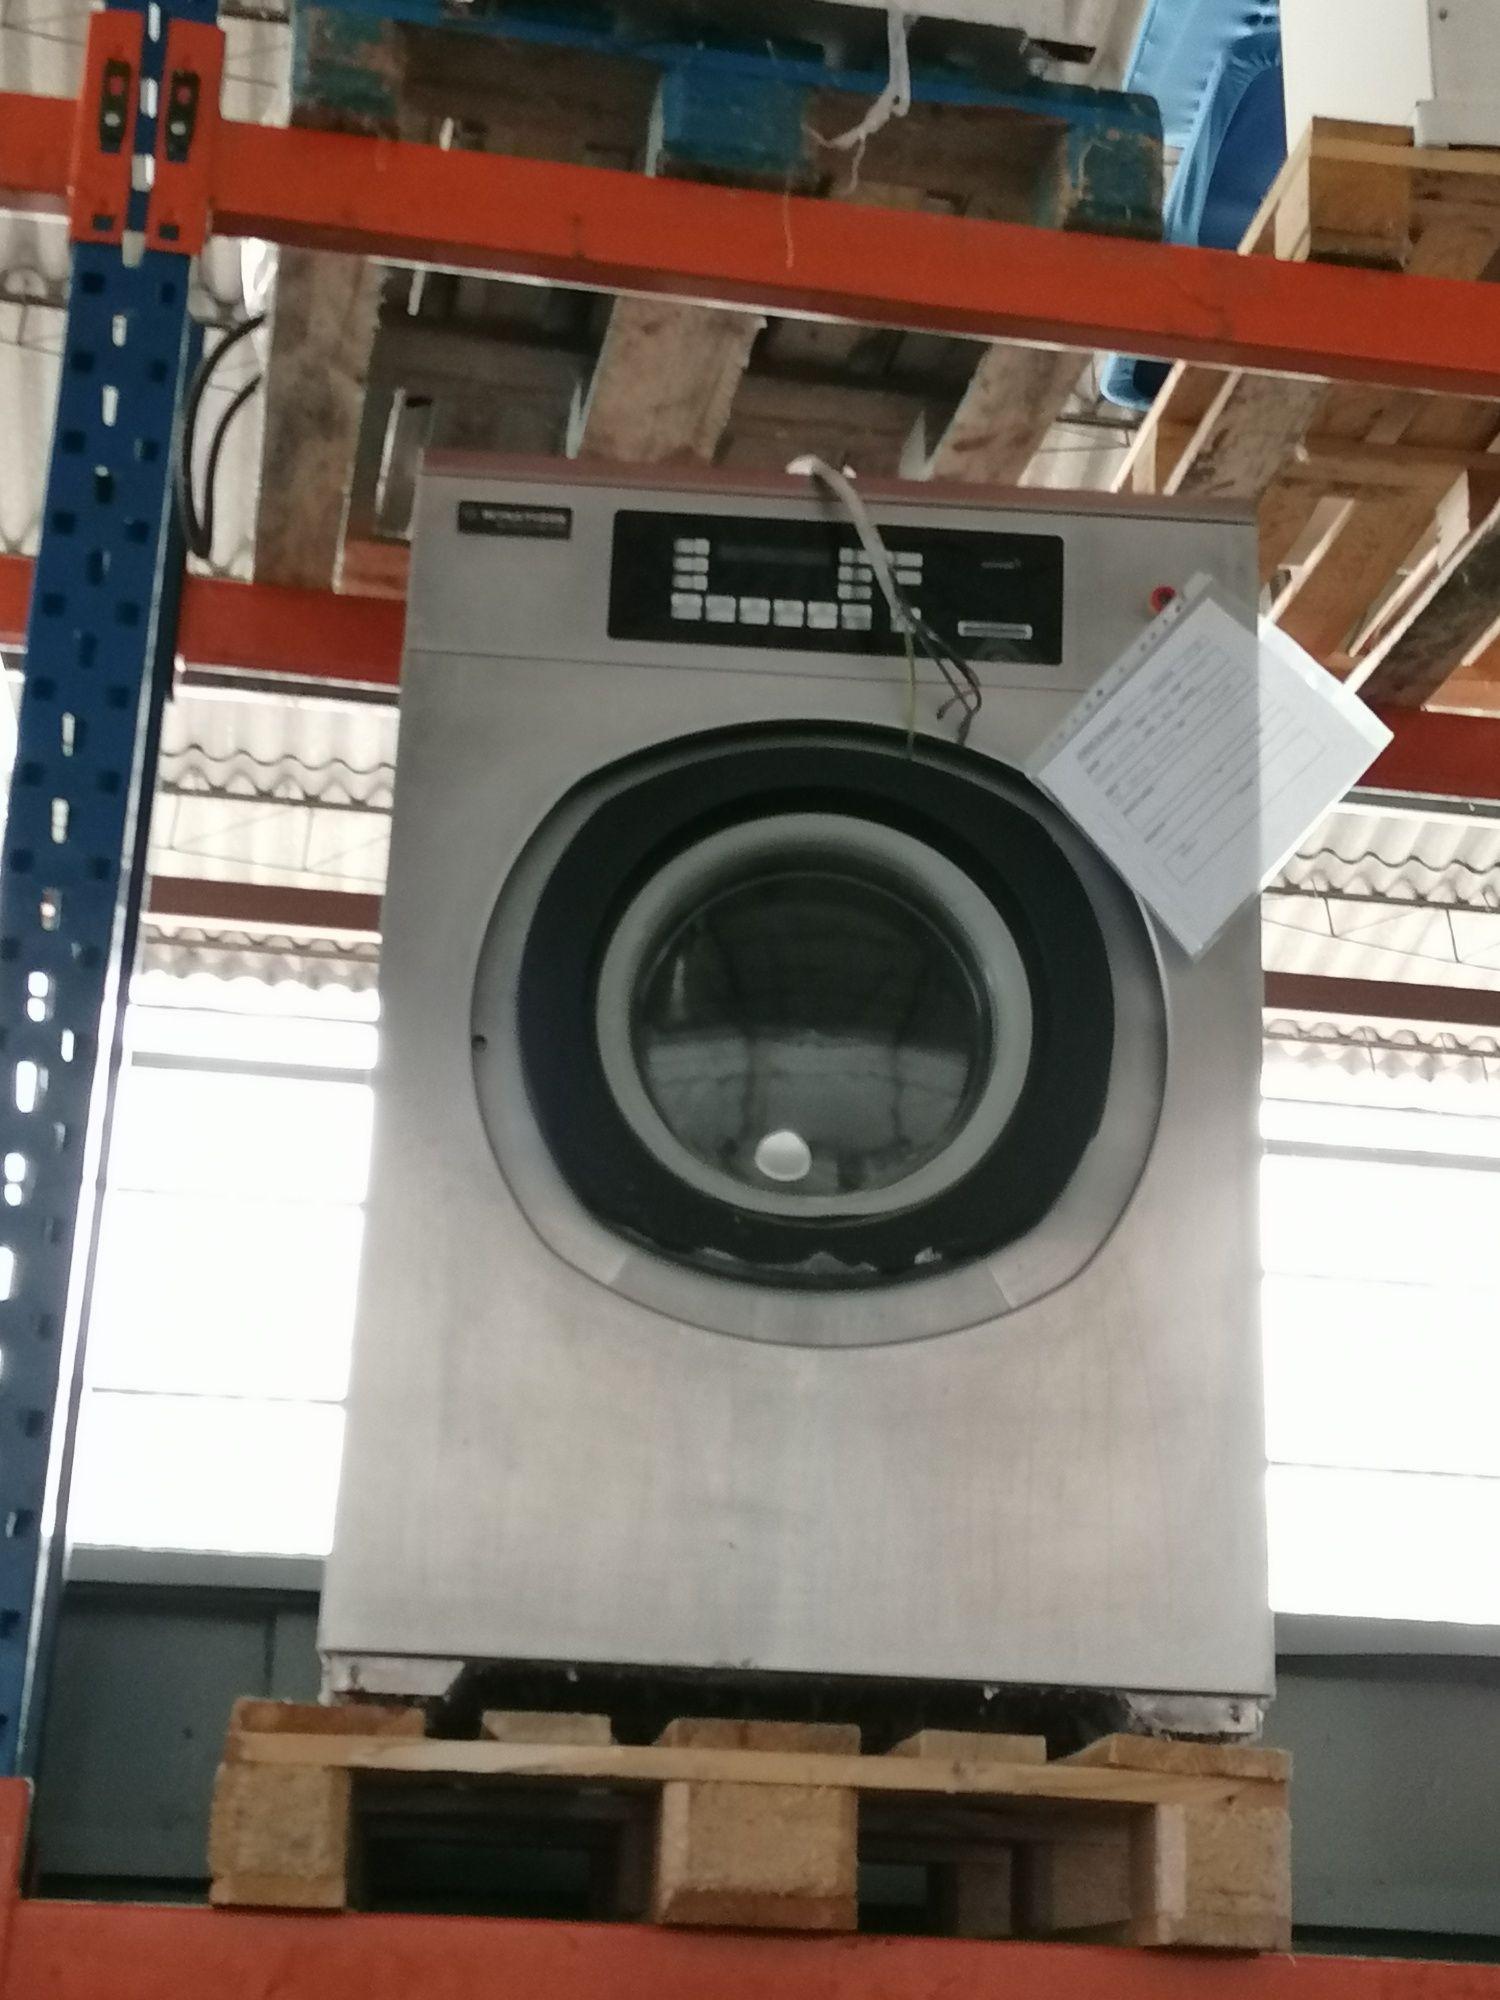 Schulthess máquina lavar roupa industrial Self-service lares séniores